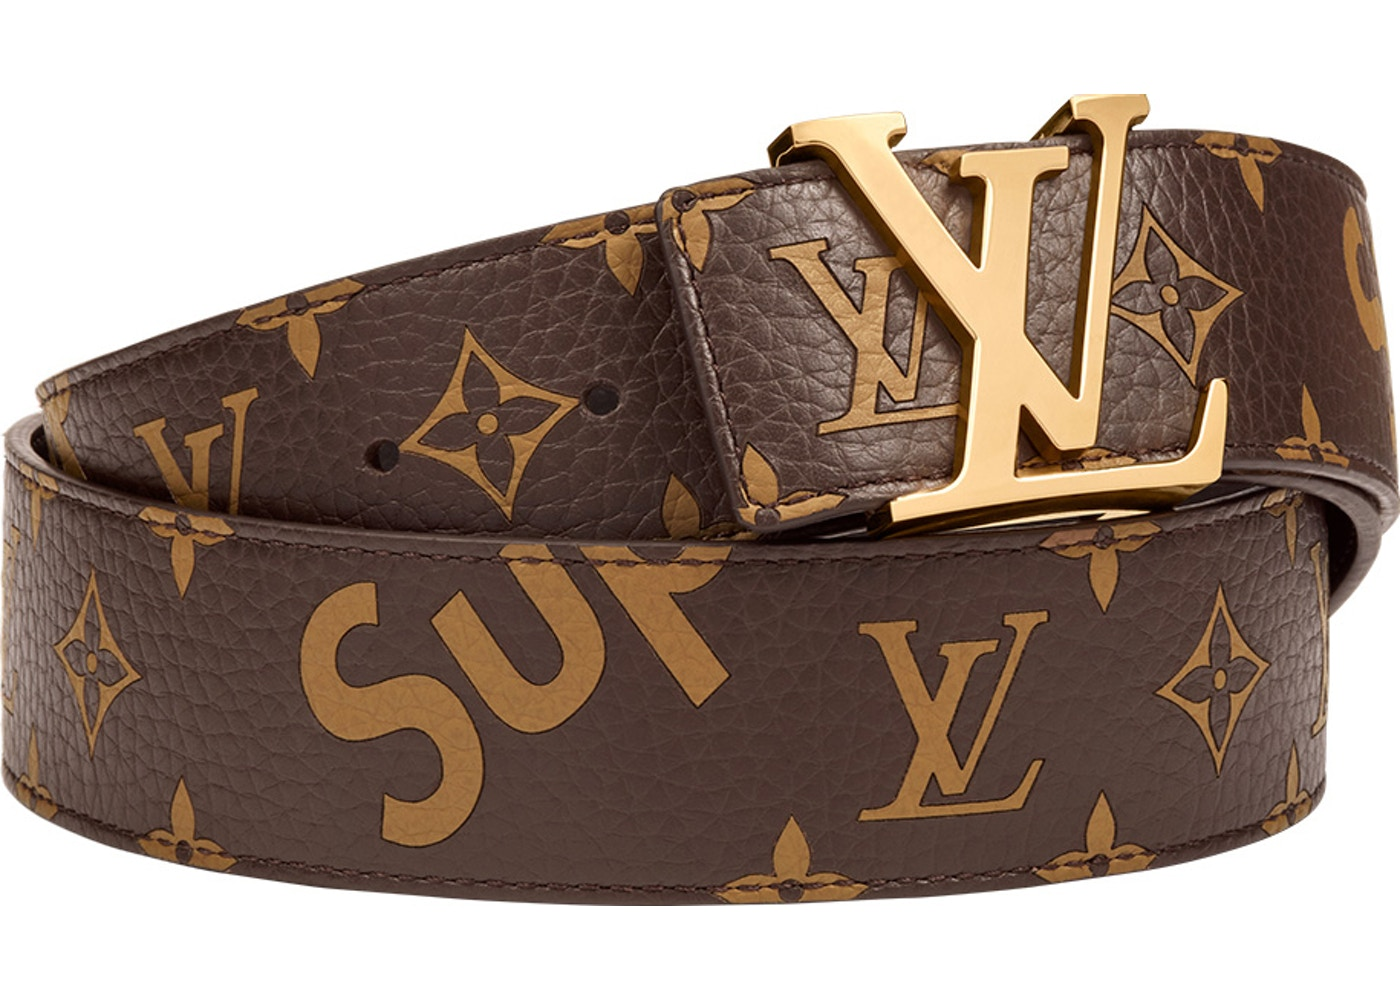 Louis Vuitton x Supreme Initiales Belt 40 MM Monogram ...